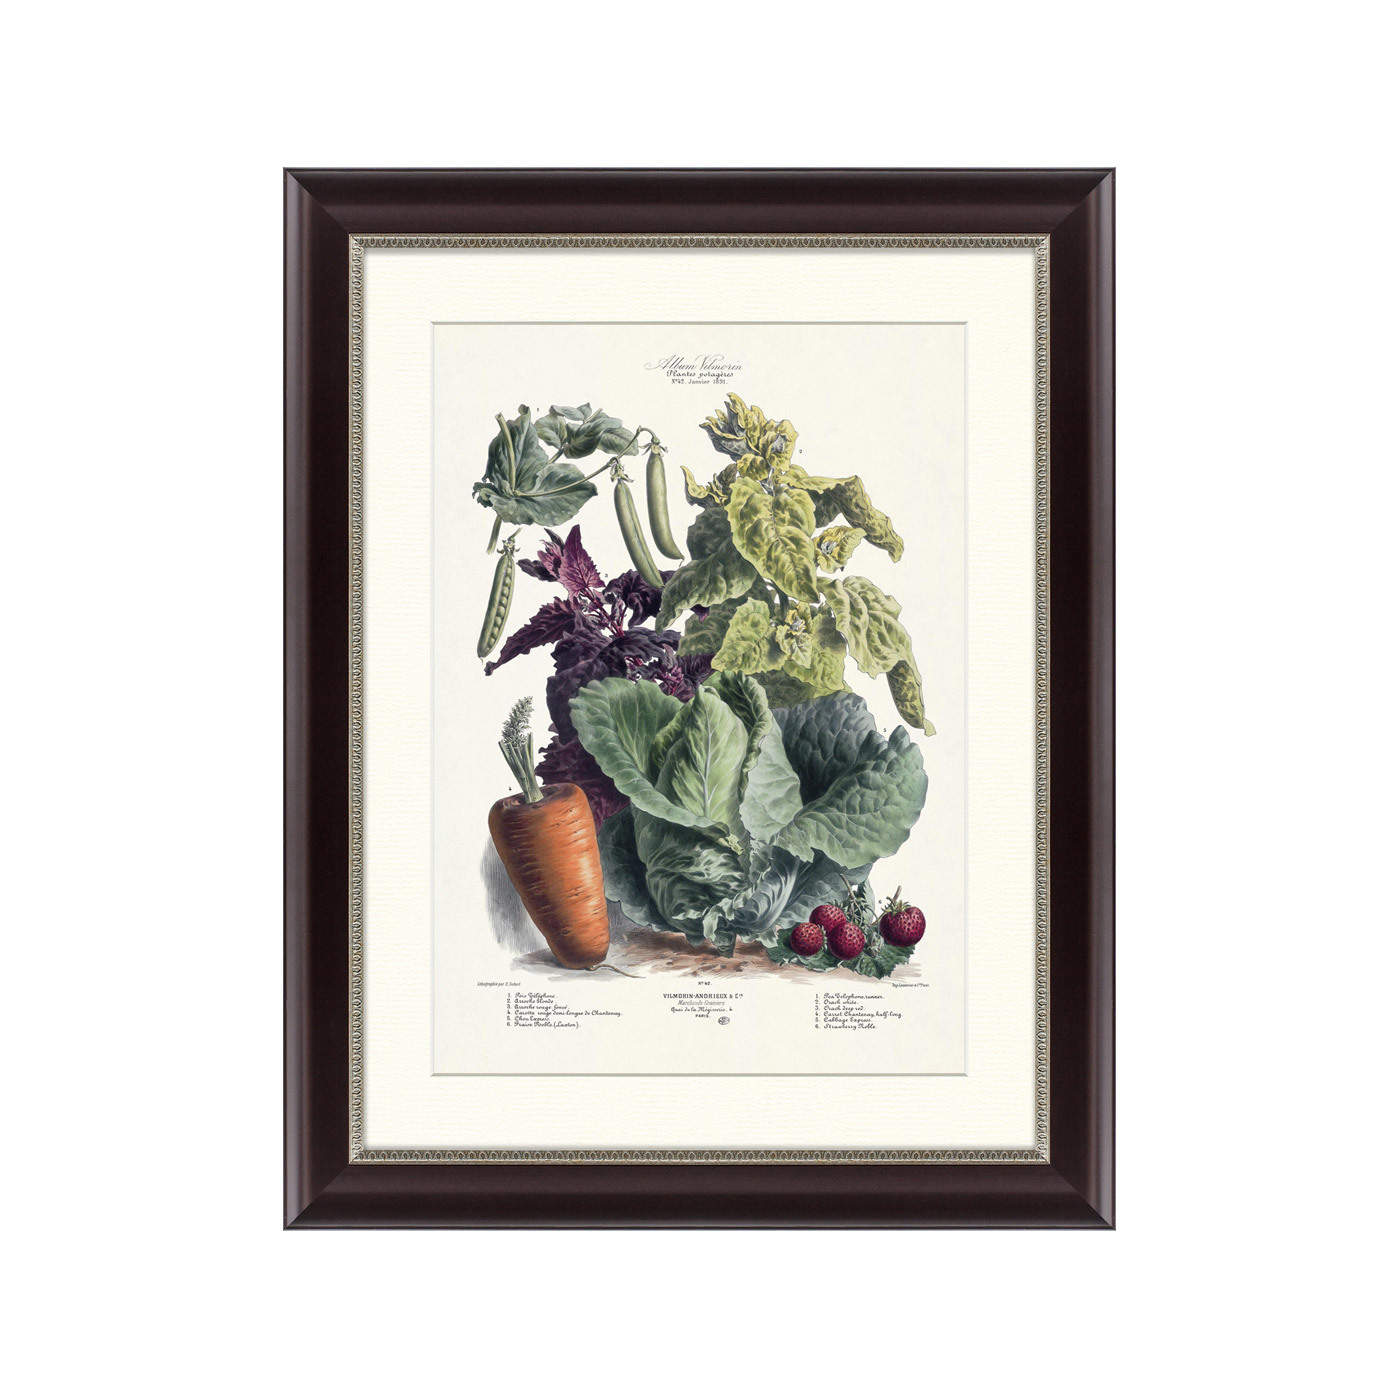 {} Картины в Квартиру Картина Vilmorin Andrieux & Cie, Альбом №42 (47х60 см) счетчики тепла в квартиру